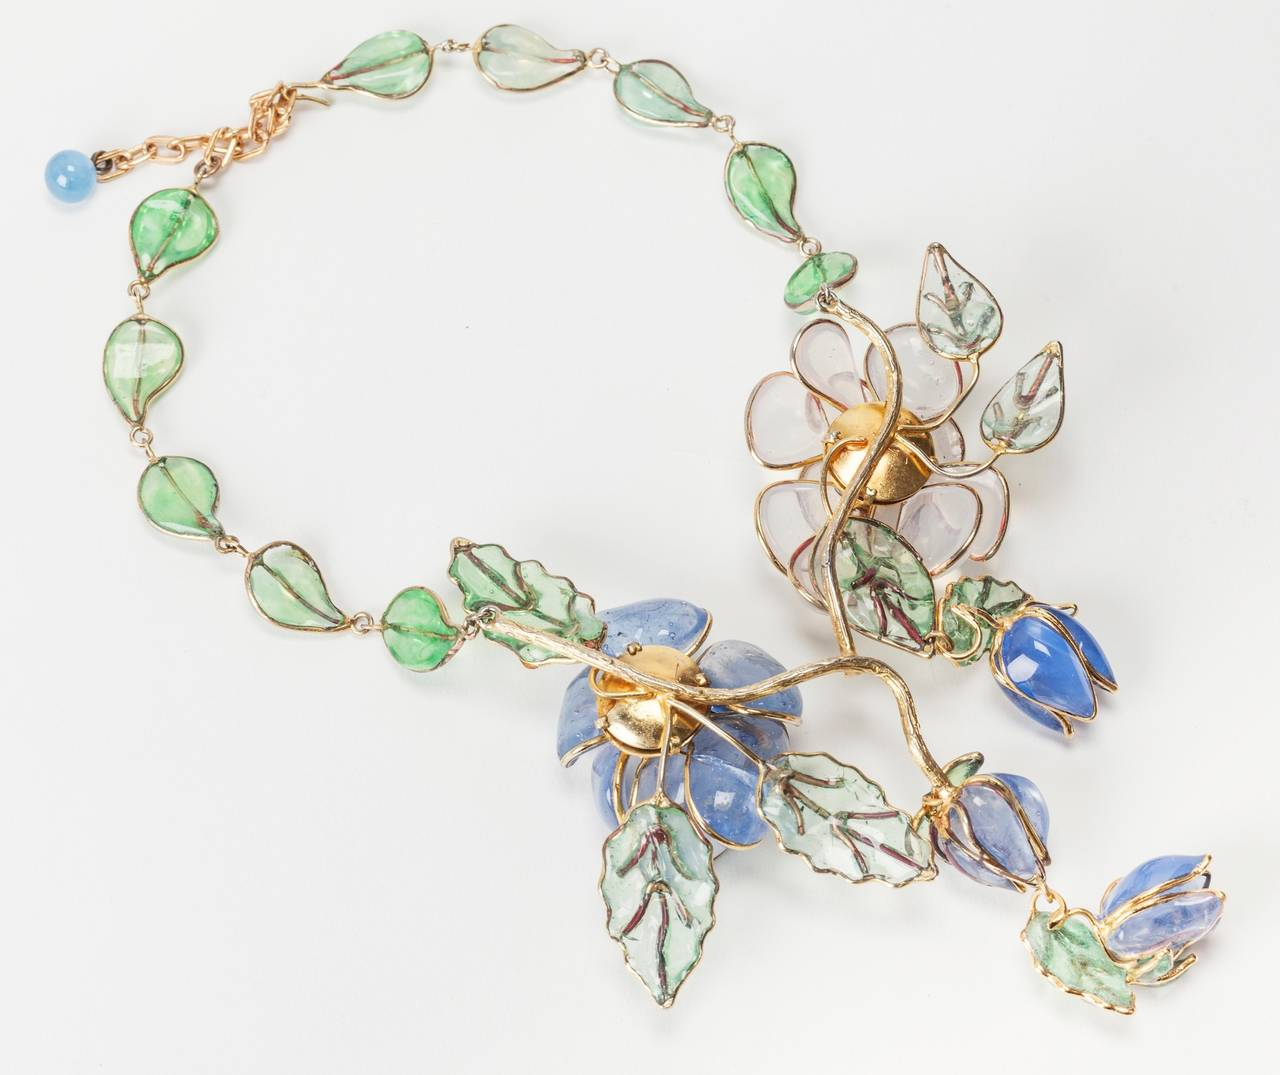 Chanel Glass Enamel Flower Necklace For Sale 1